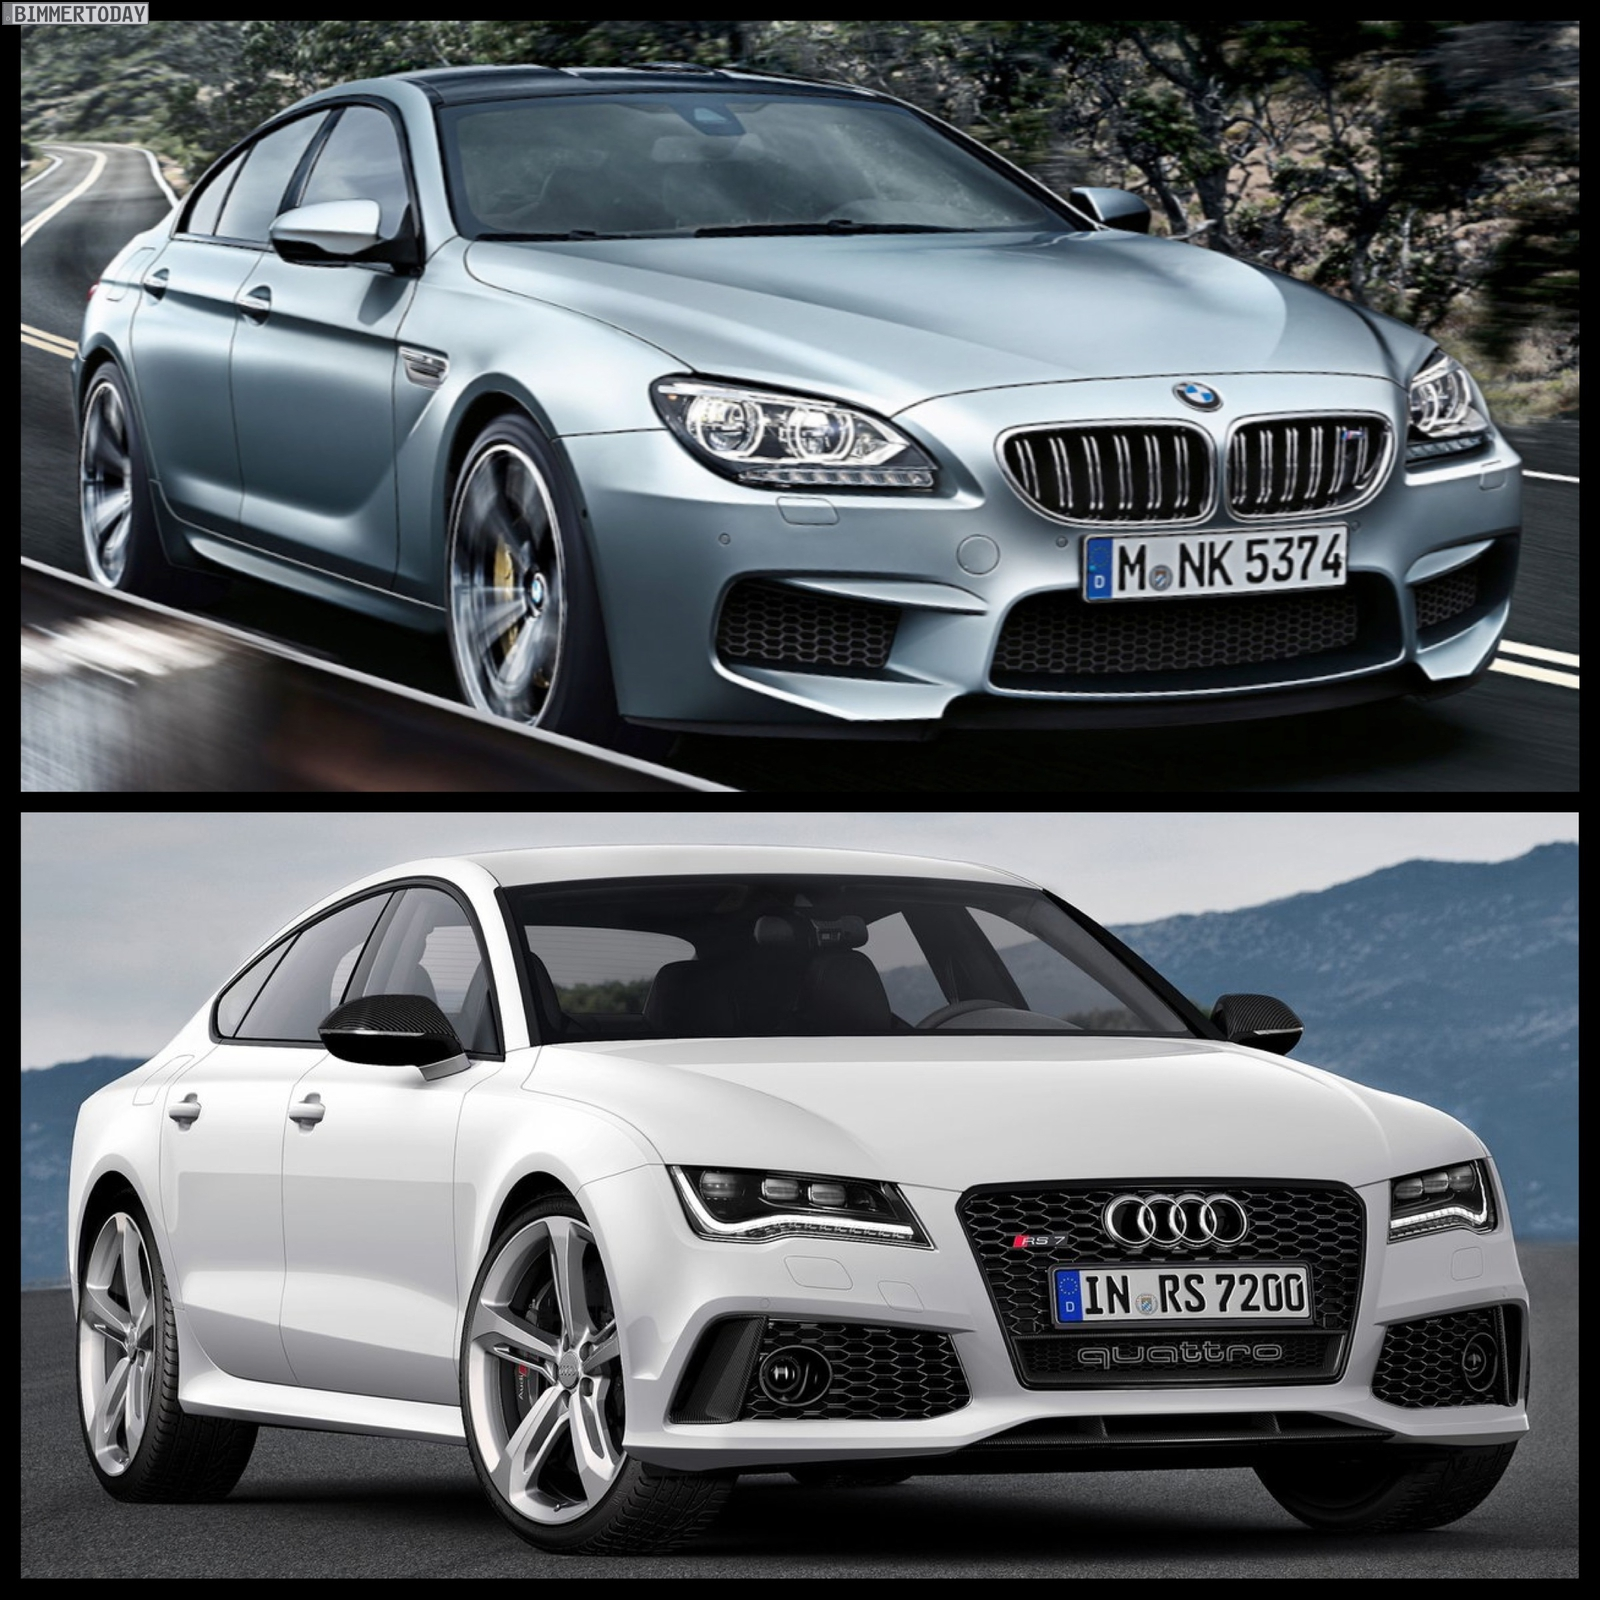 Bmw Z 8 For Sale: Photo Comparison: BMW M6 Gran Coupe Vs Audi RS7